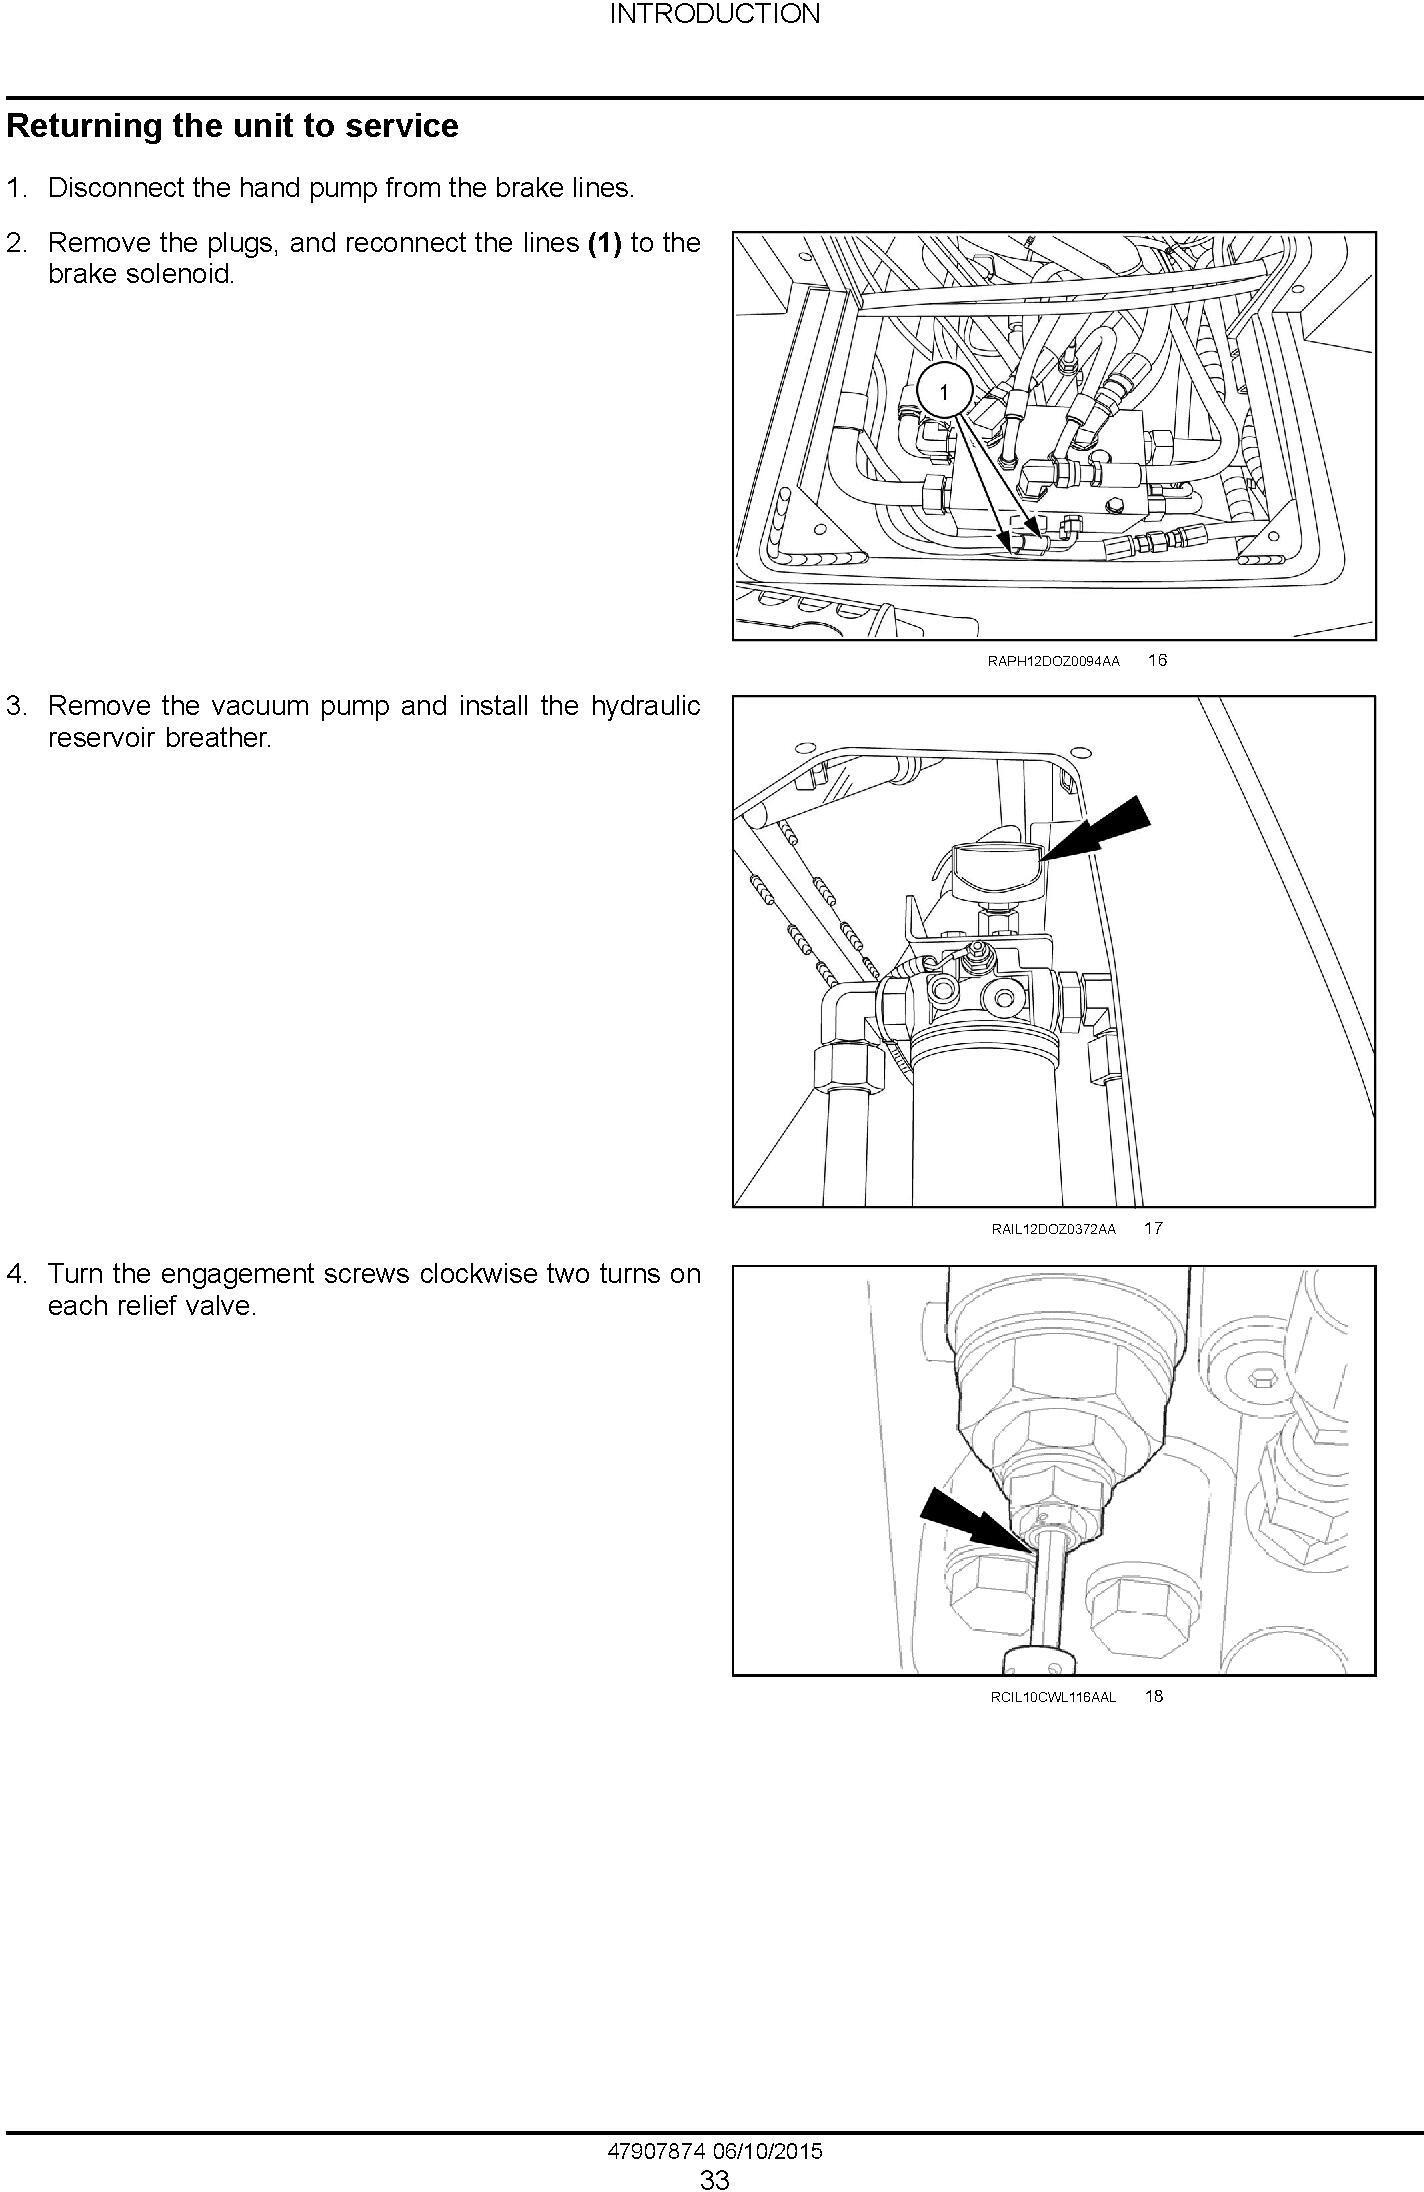 New Holland D125C Stage IIIB Crawler dozer Service Manual - 1